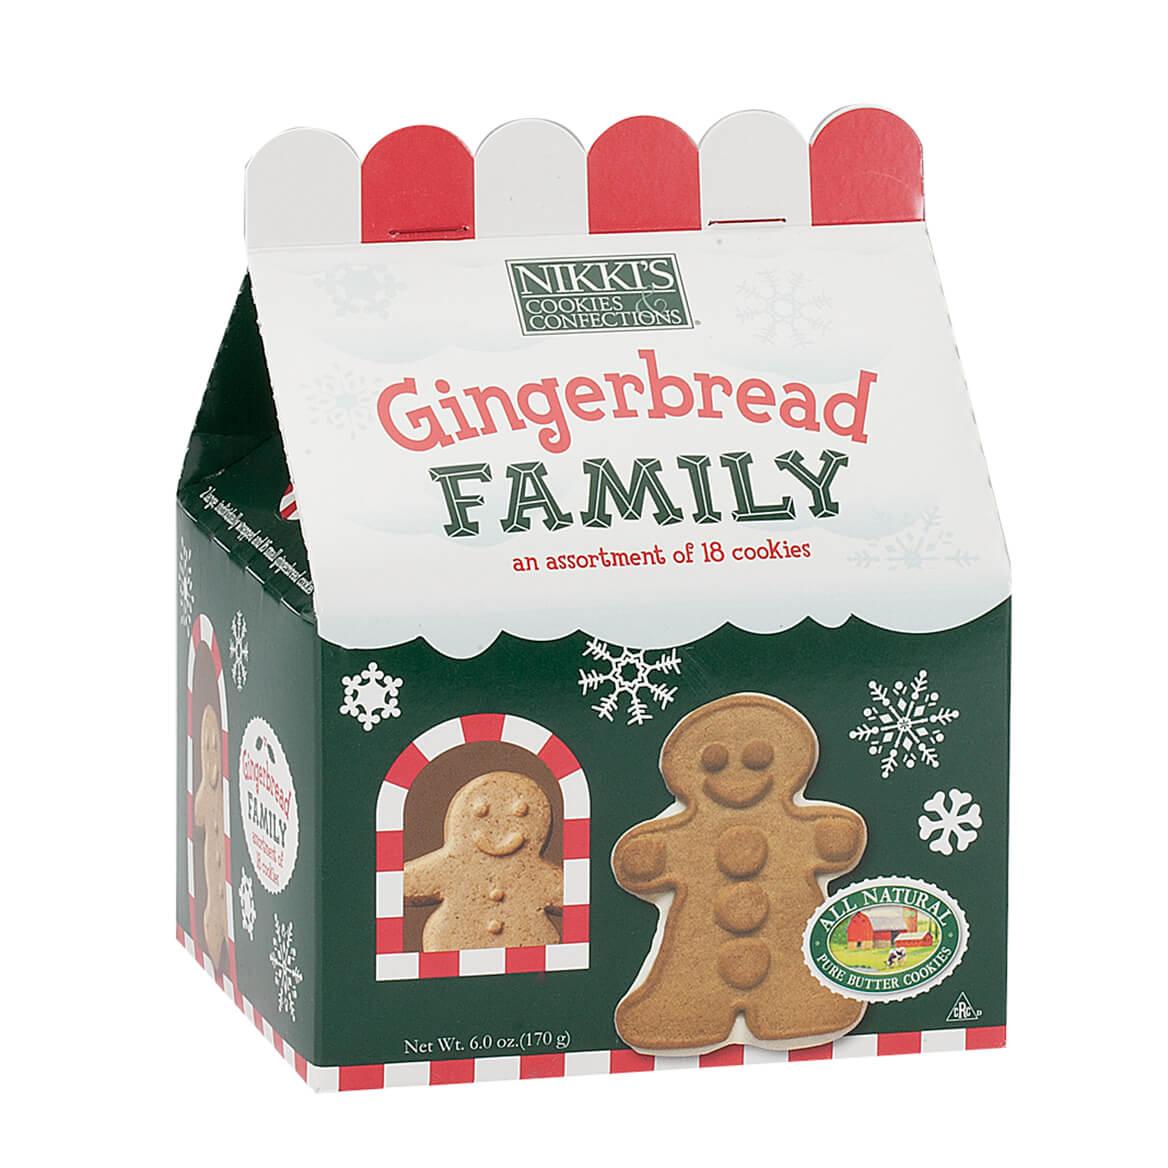 Gingerbread Family Box, 6 oz.